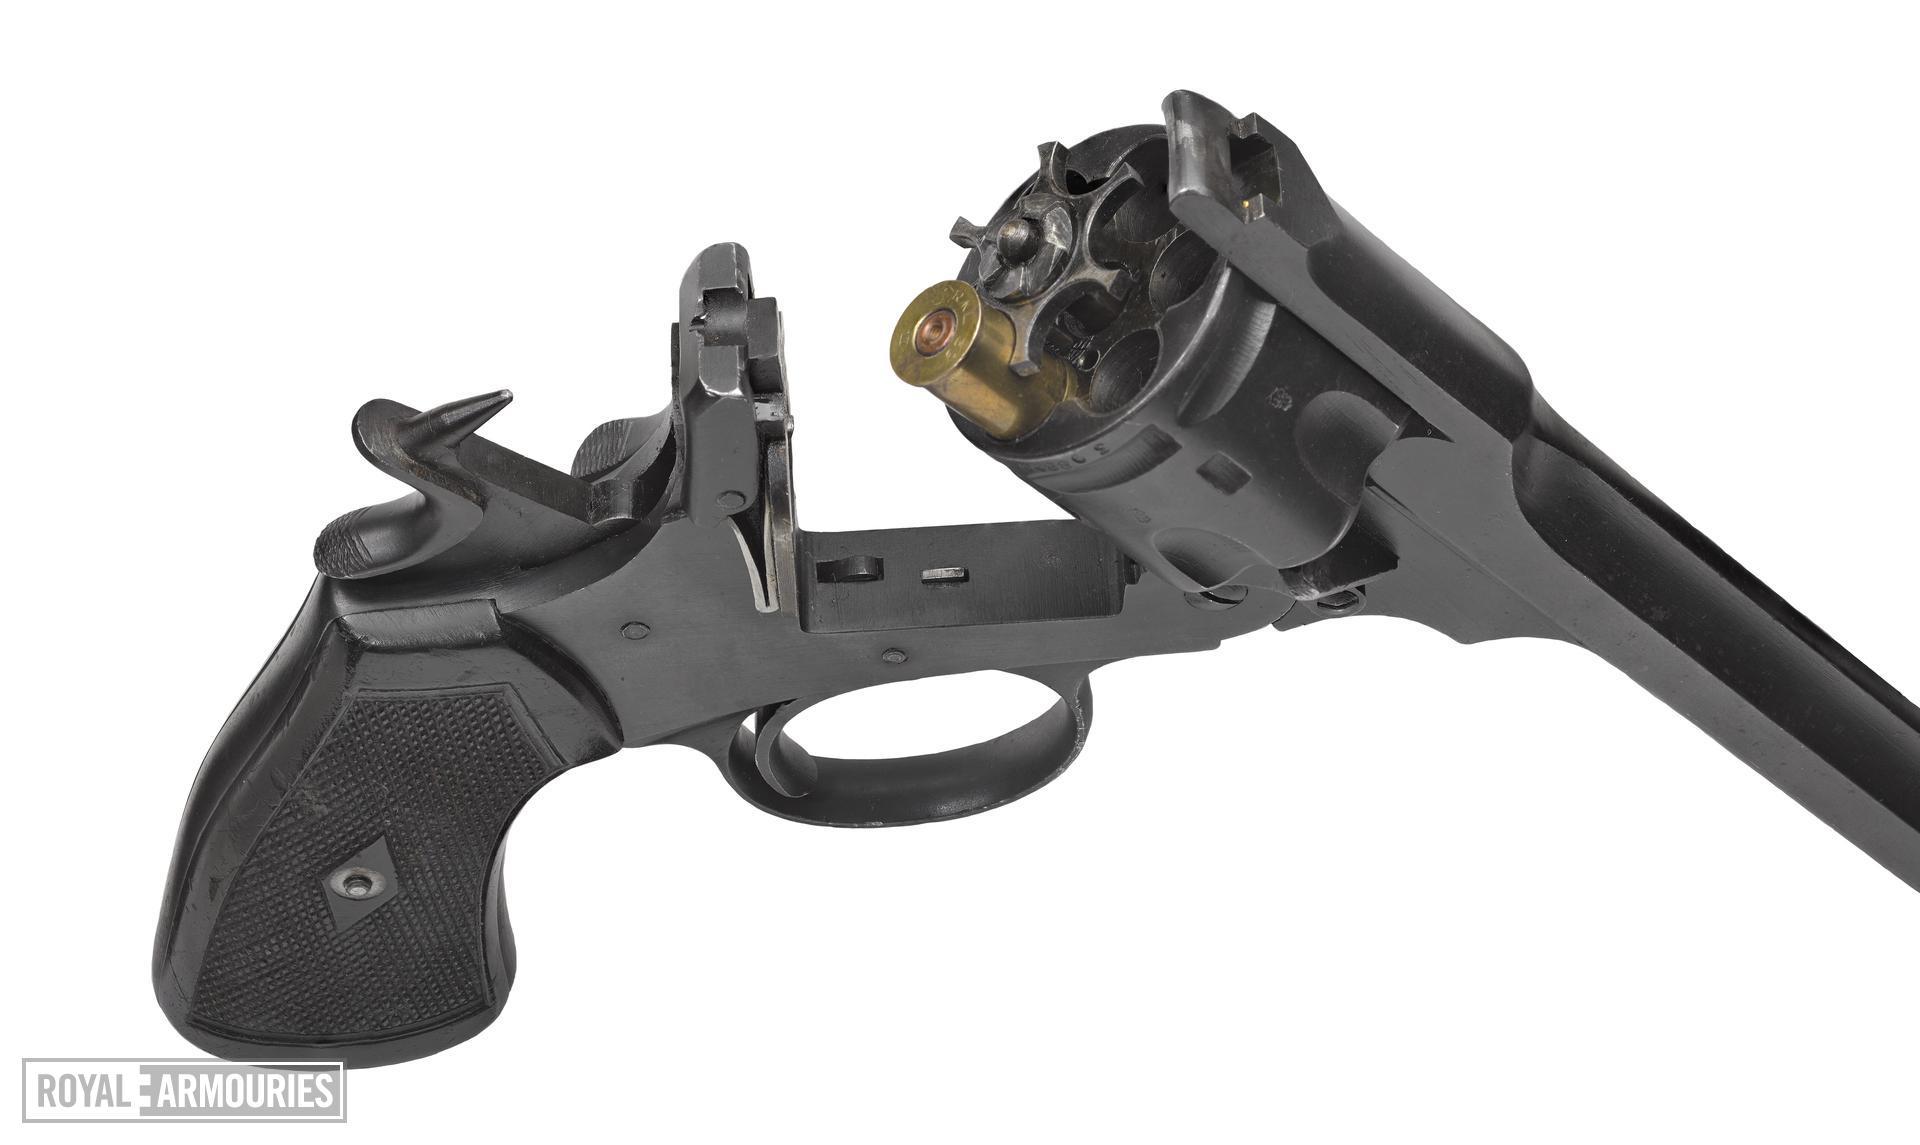 Webley Mk VI centrefire six shot revolver, Britain, about 1918